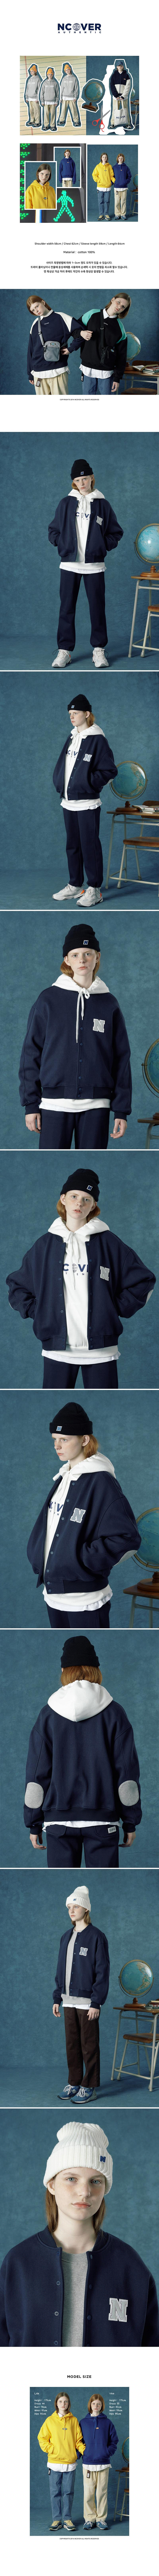 Baseball jacket-navy.jpg